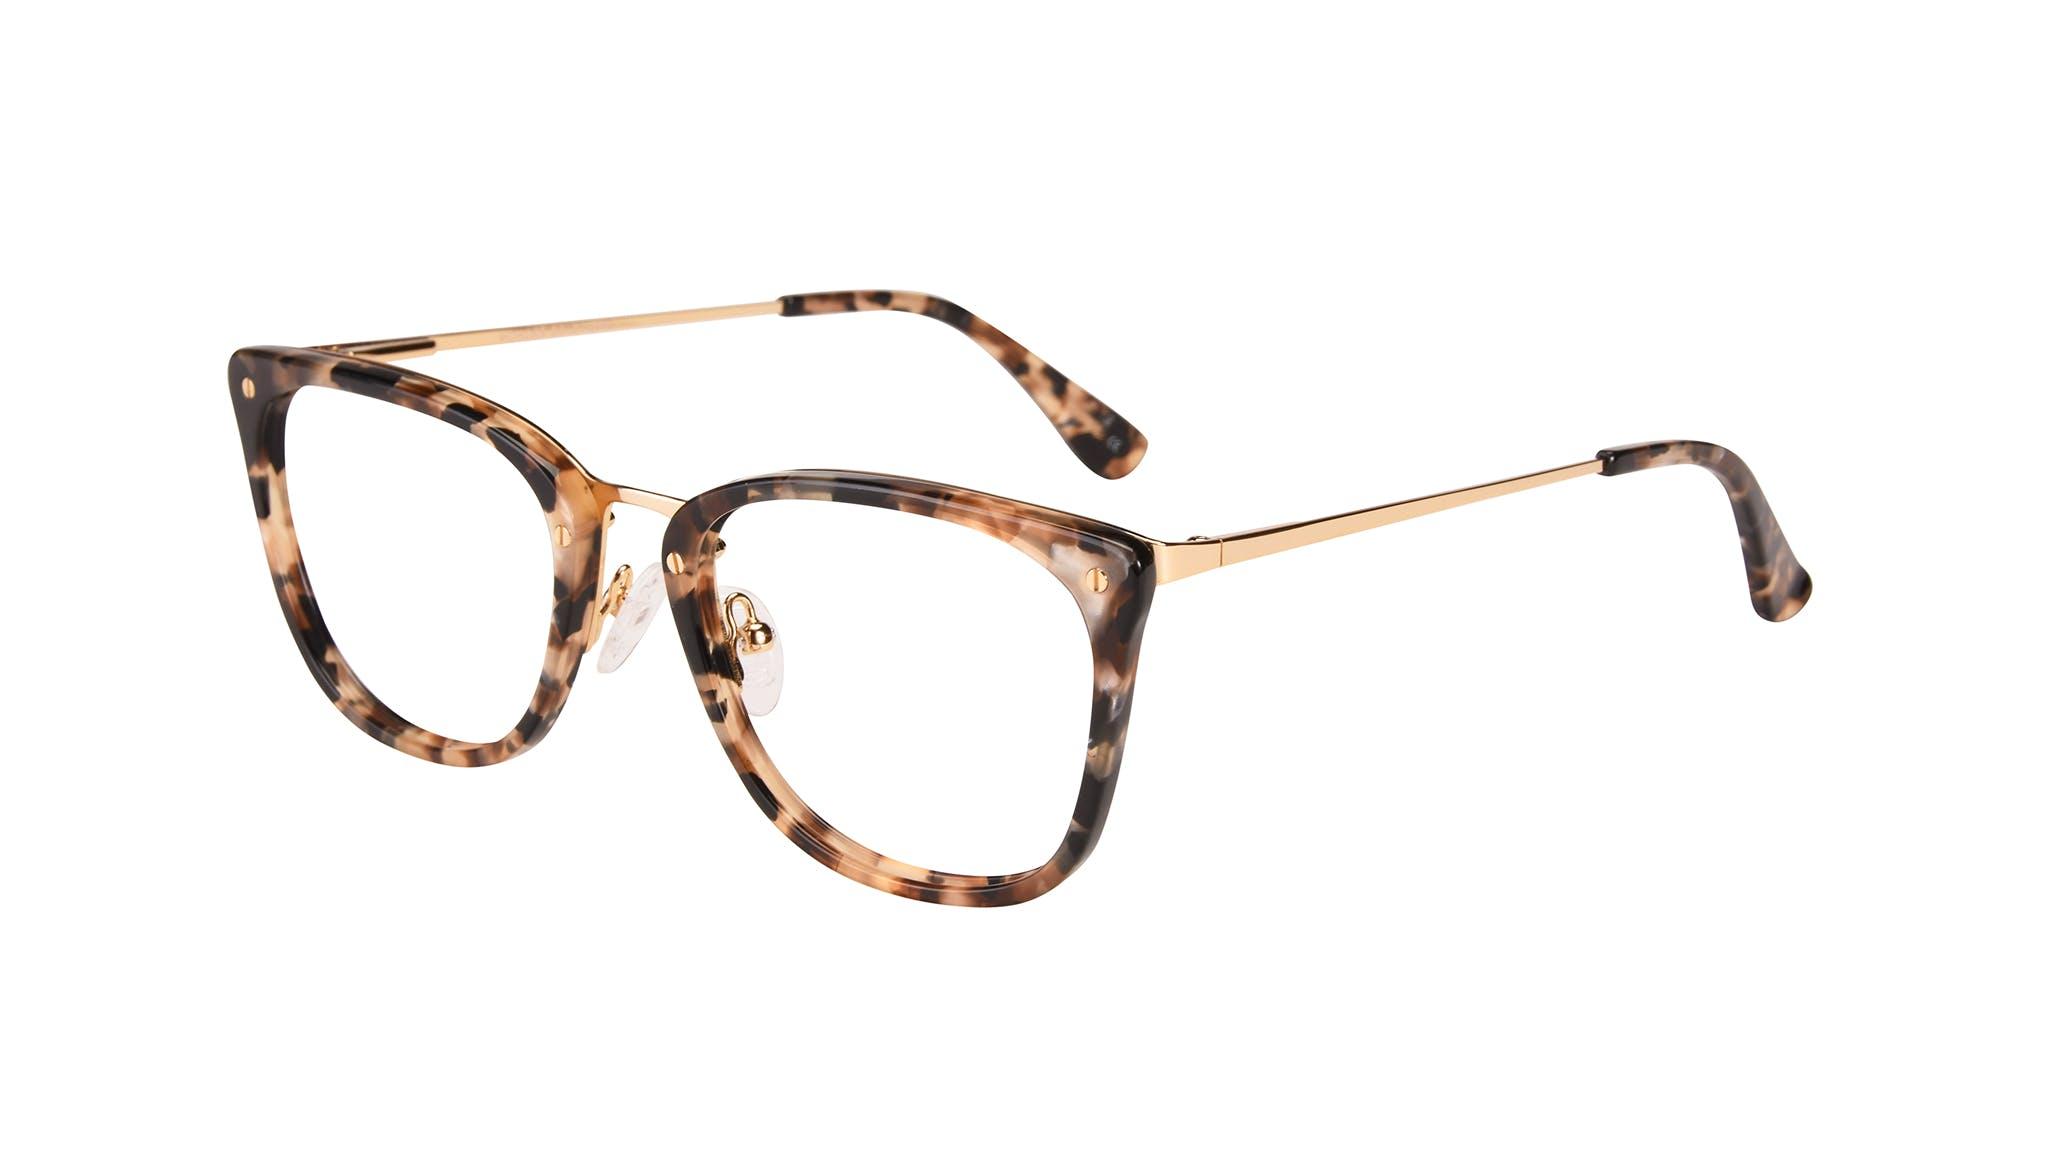 Affordable Fashion Glasses Rectangle Eyeglasses Women Wonder Gold Flake Tilt